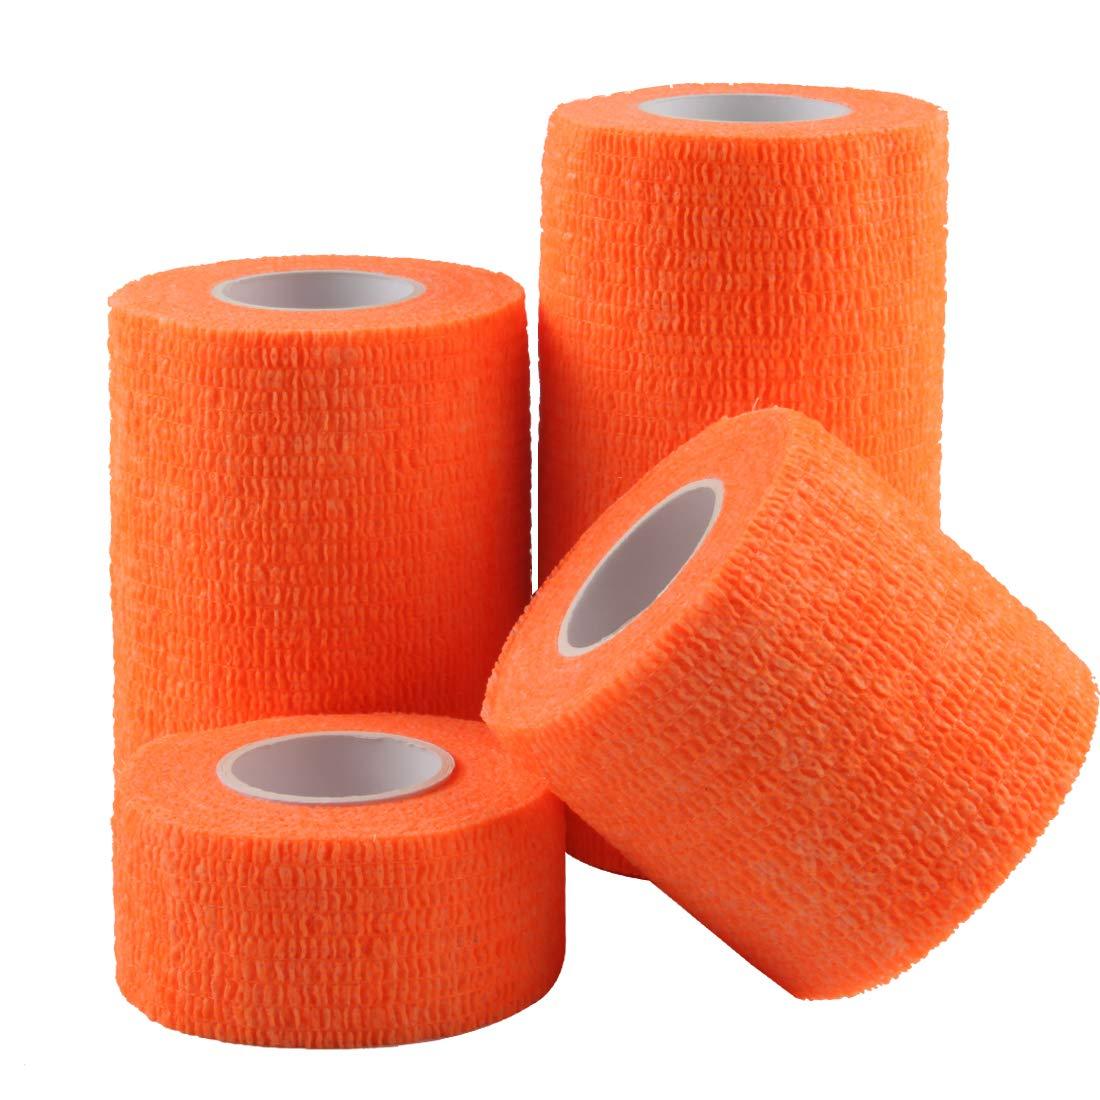 Desert Camouflage Andux Zone Self-Adhesive Bandage 4 Rolls of Different Sizes Cohesive Wrap Bandaging Tape ZZTXBD-04